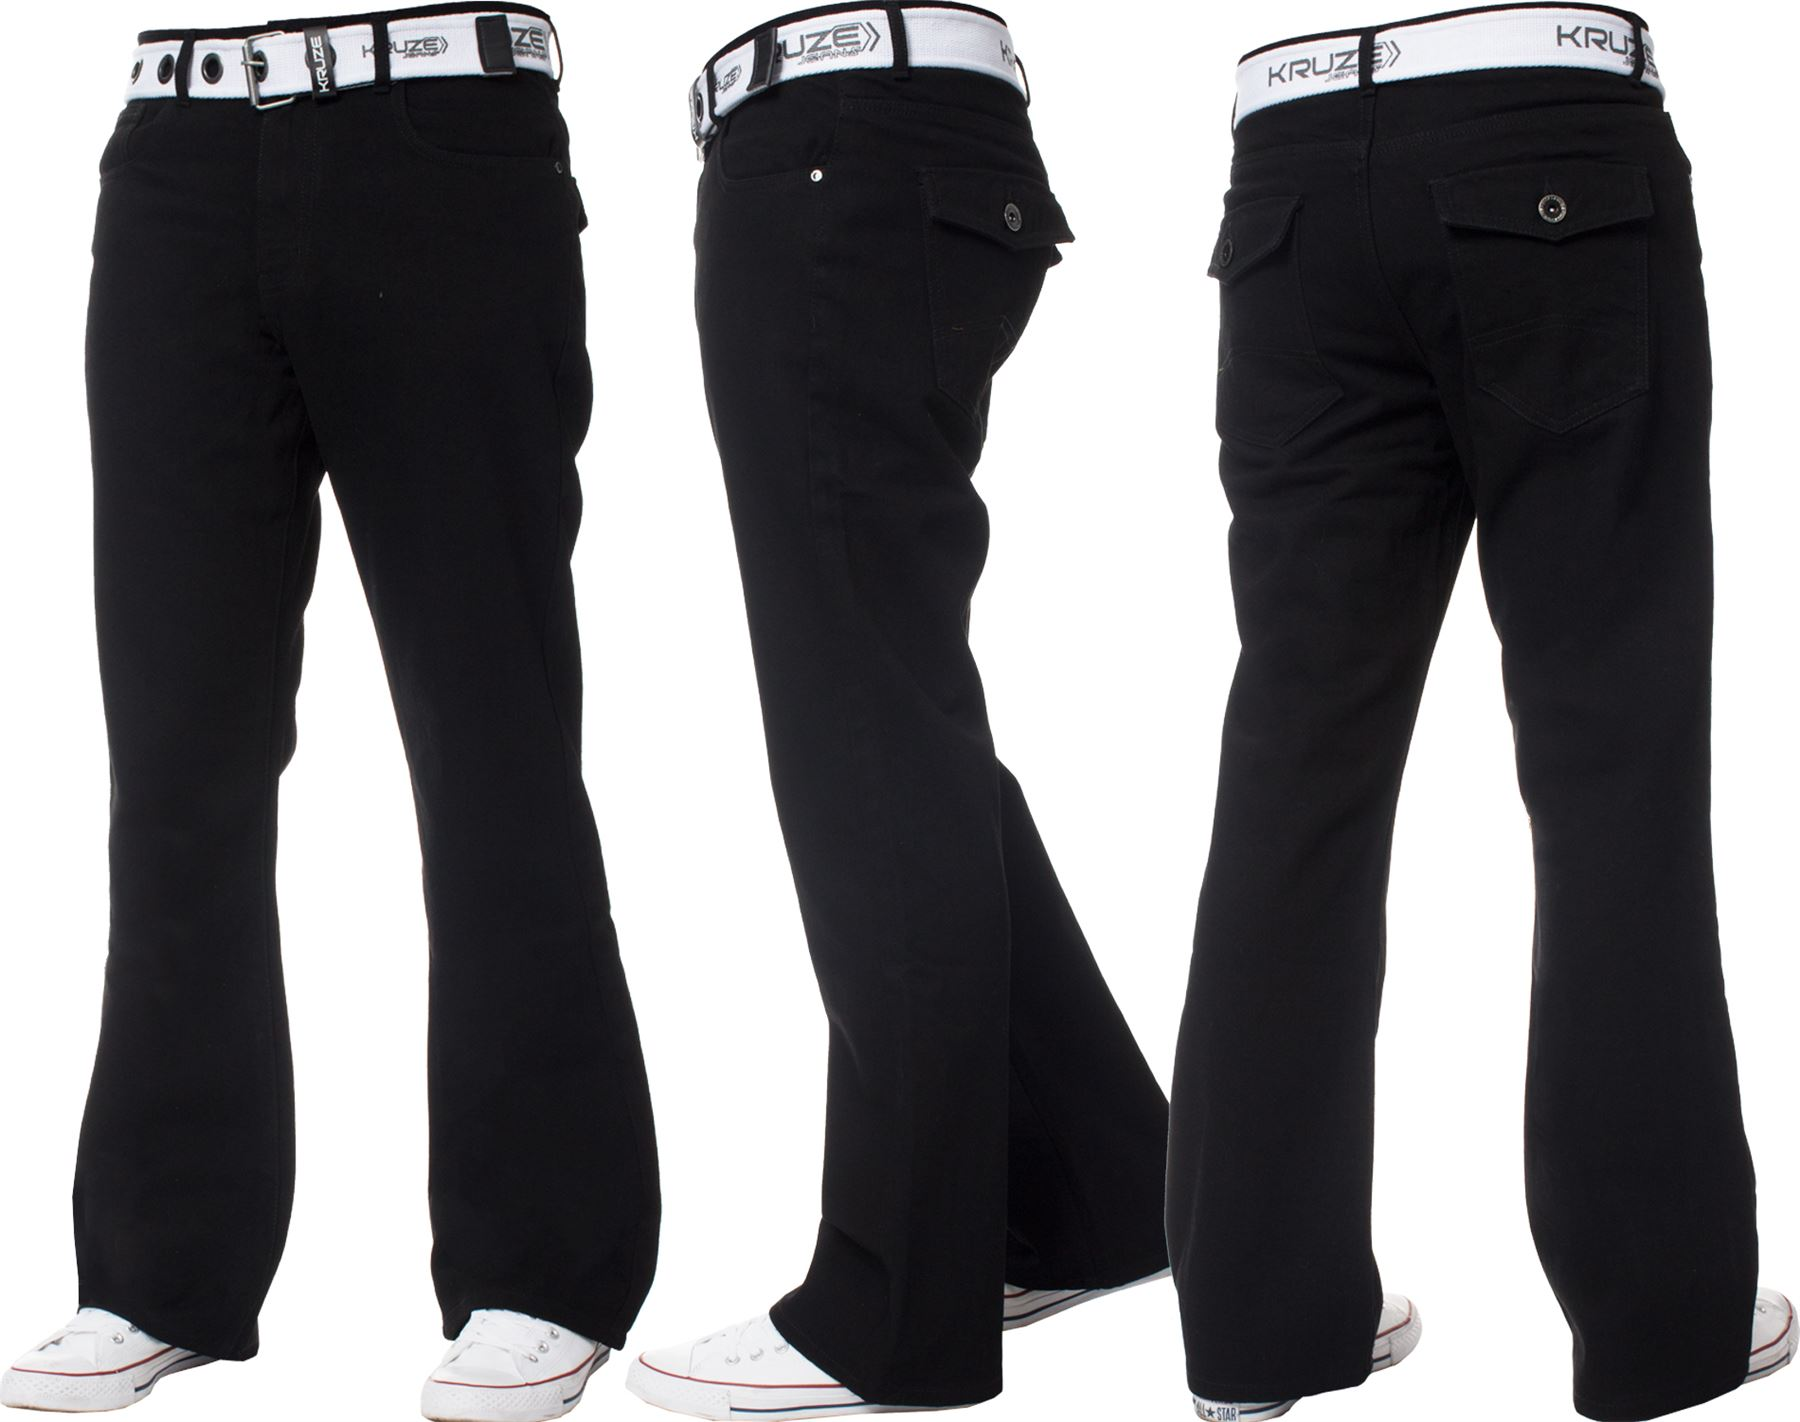 New-Kruze-Mens-Bootcut-Flare-Jeans-Wide-Leg-Denim-Pants-Big-King-All-Waist-Sizes